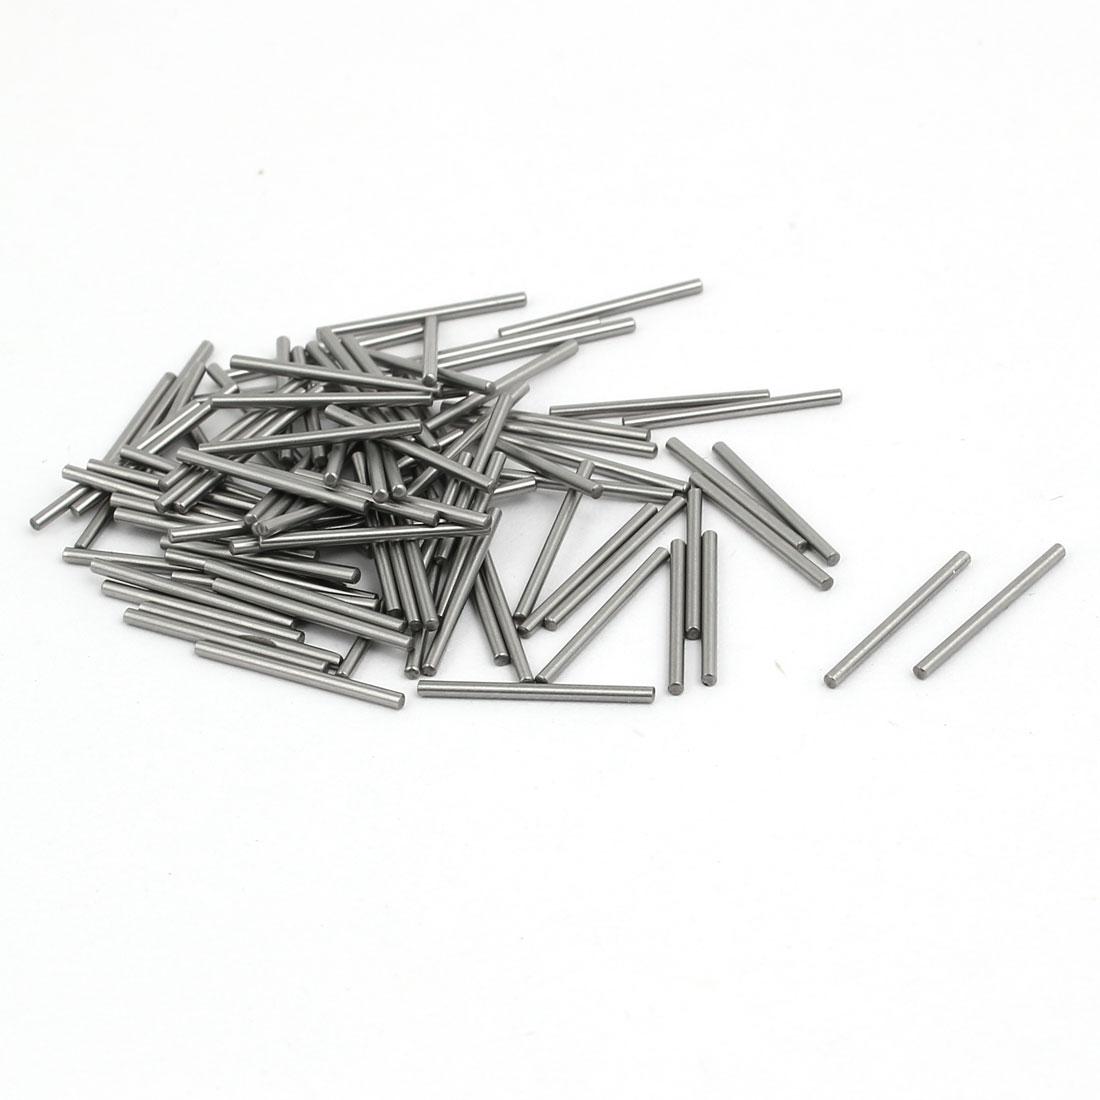 2mmx16mm Metal Parallel Dowel Pins Fasten Elements Silver Tone 100pcs